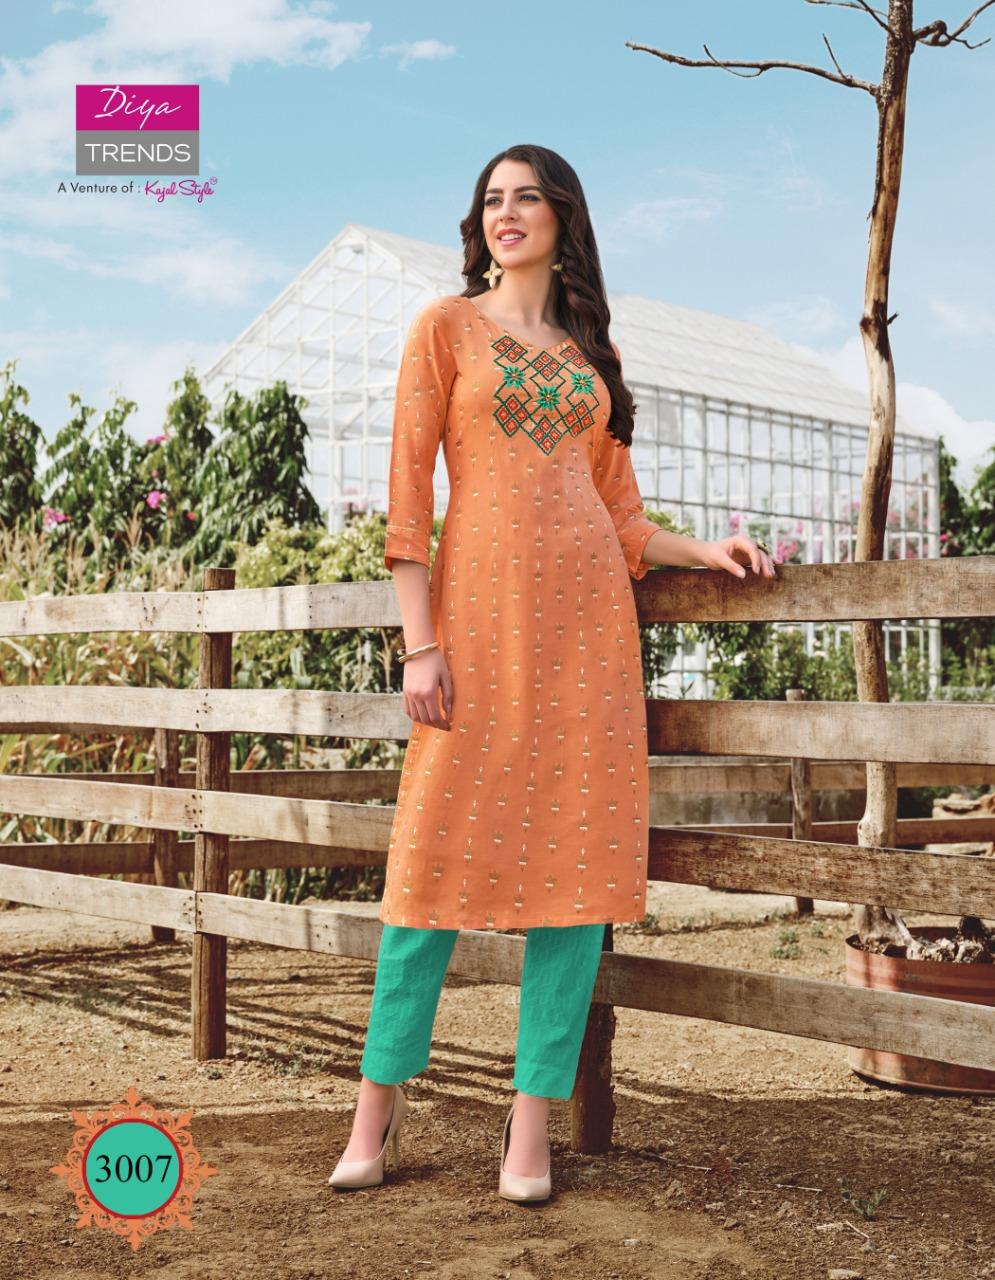 Diya Trends Victoria Vol 3 by Kajal Style Kurti Wholesale Catalog 12 Pcs 8 - Diya Trends Victoria Vol 3 by Kajal Style Kurti Wholesale Catalog 12 Pcs